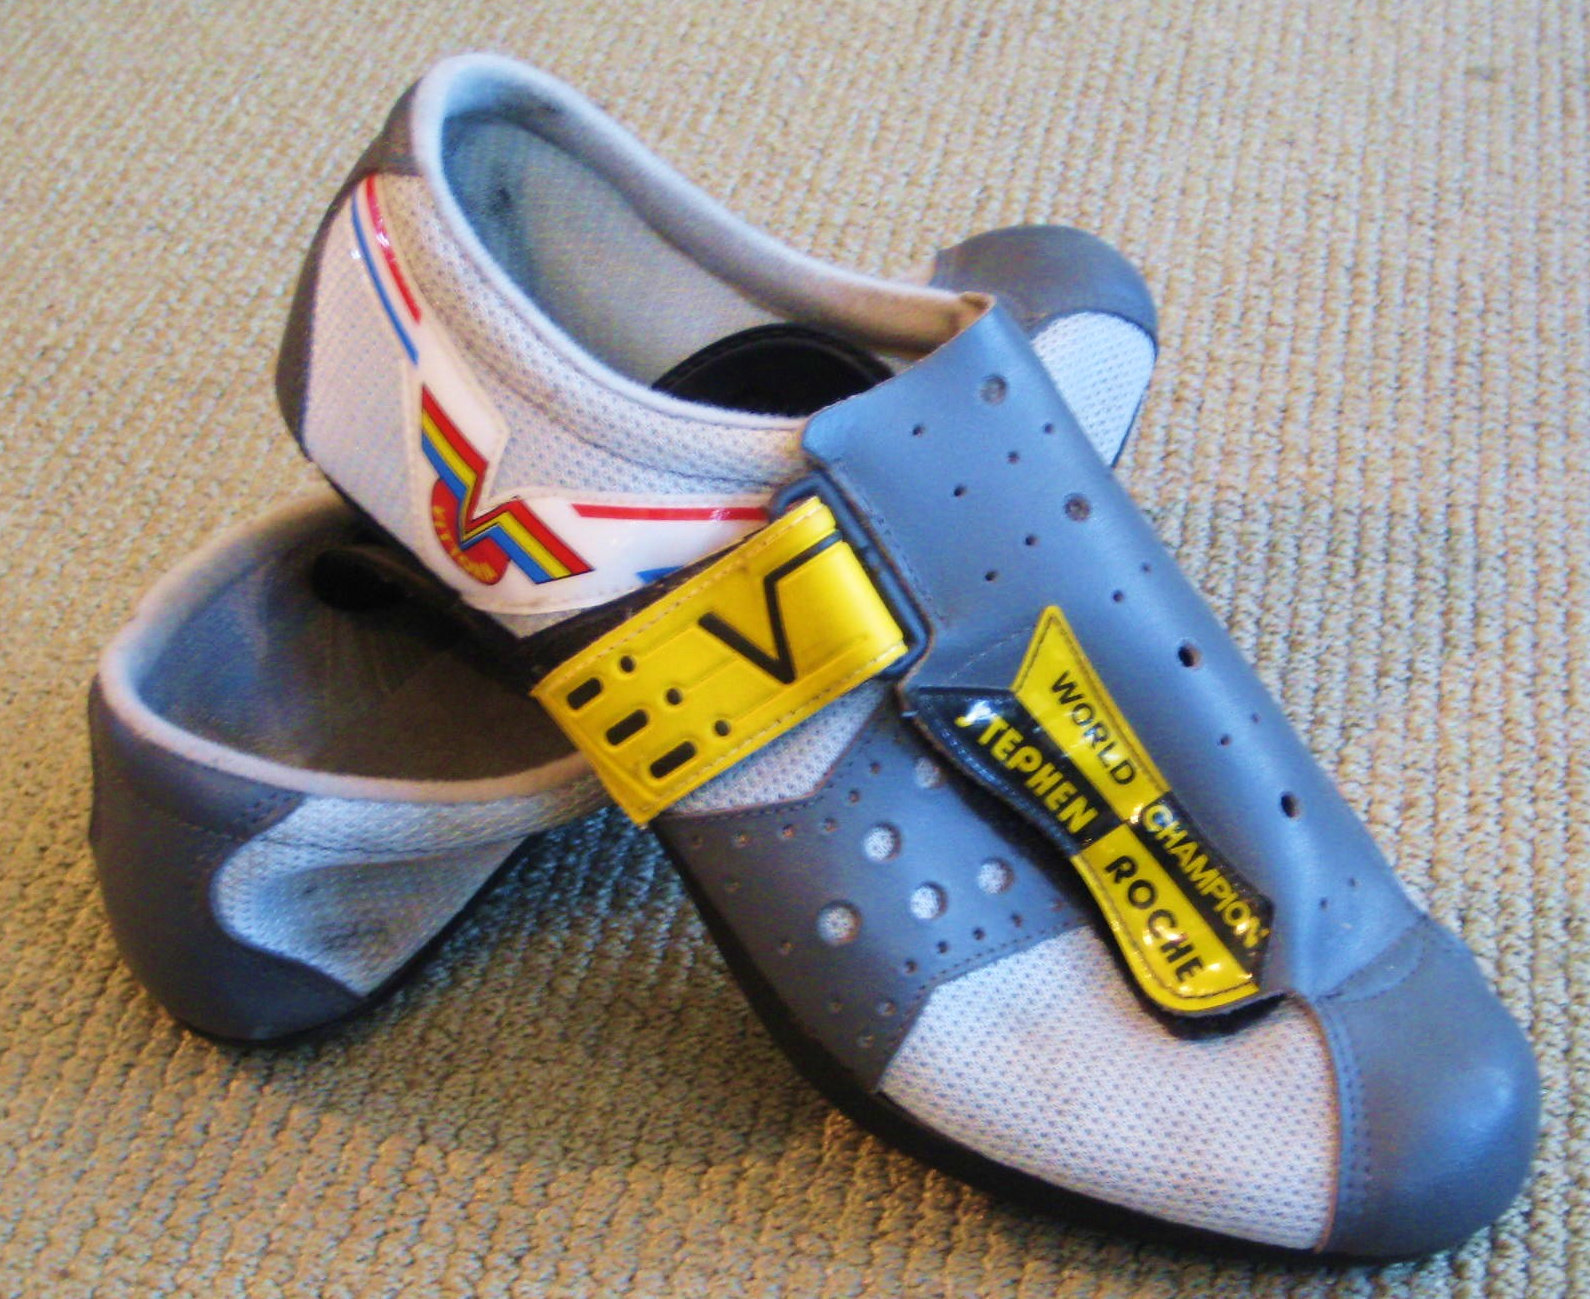 Stephen Roche egykori cipője